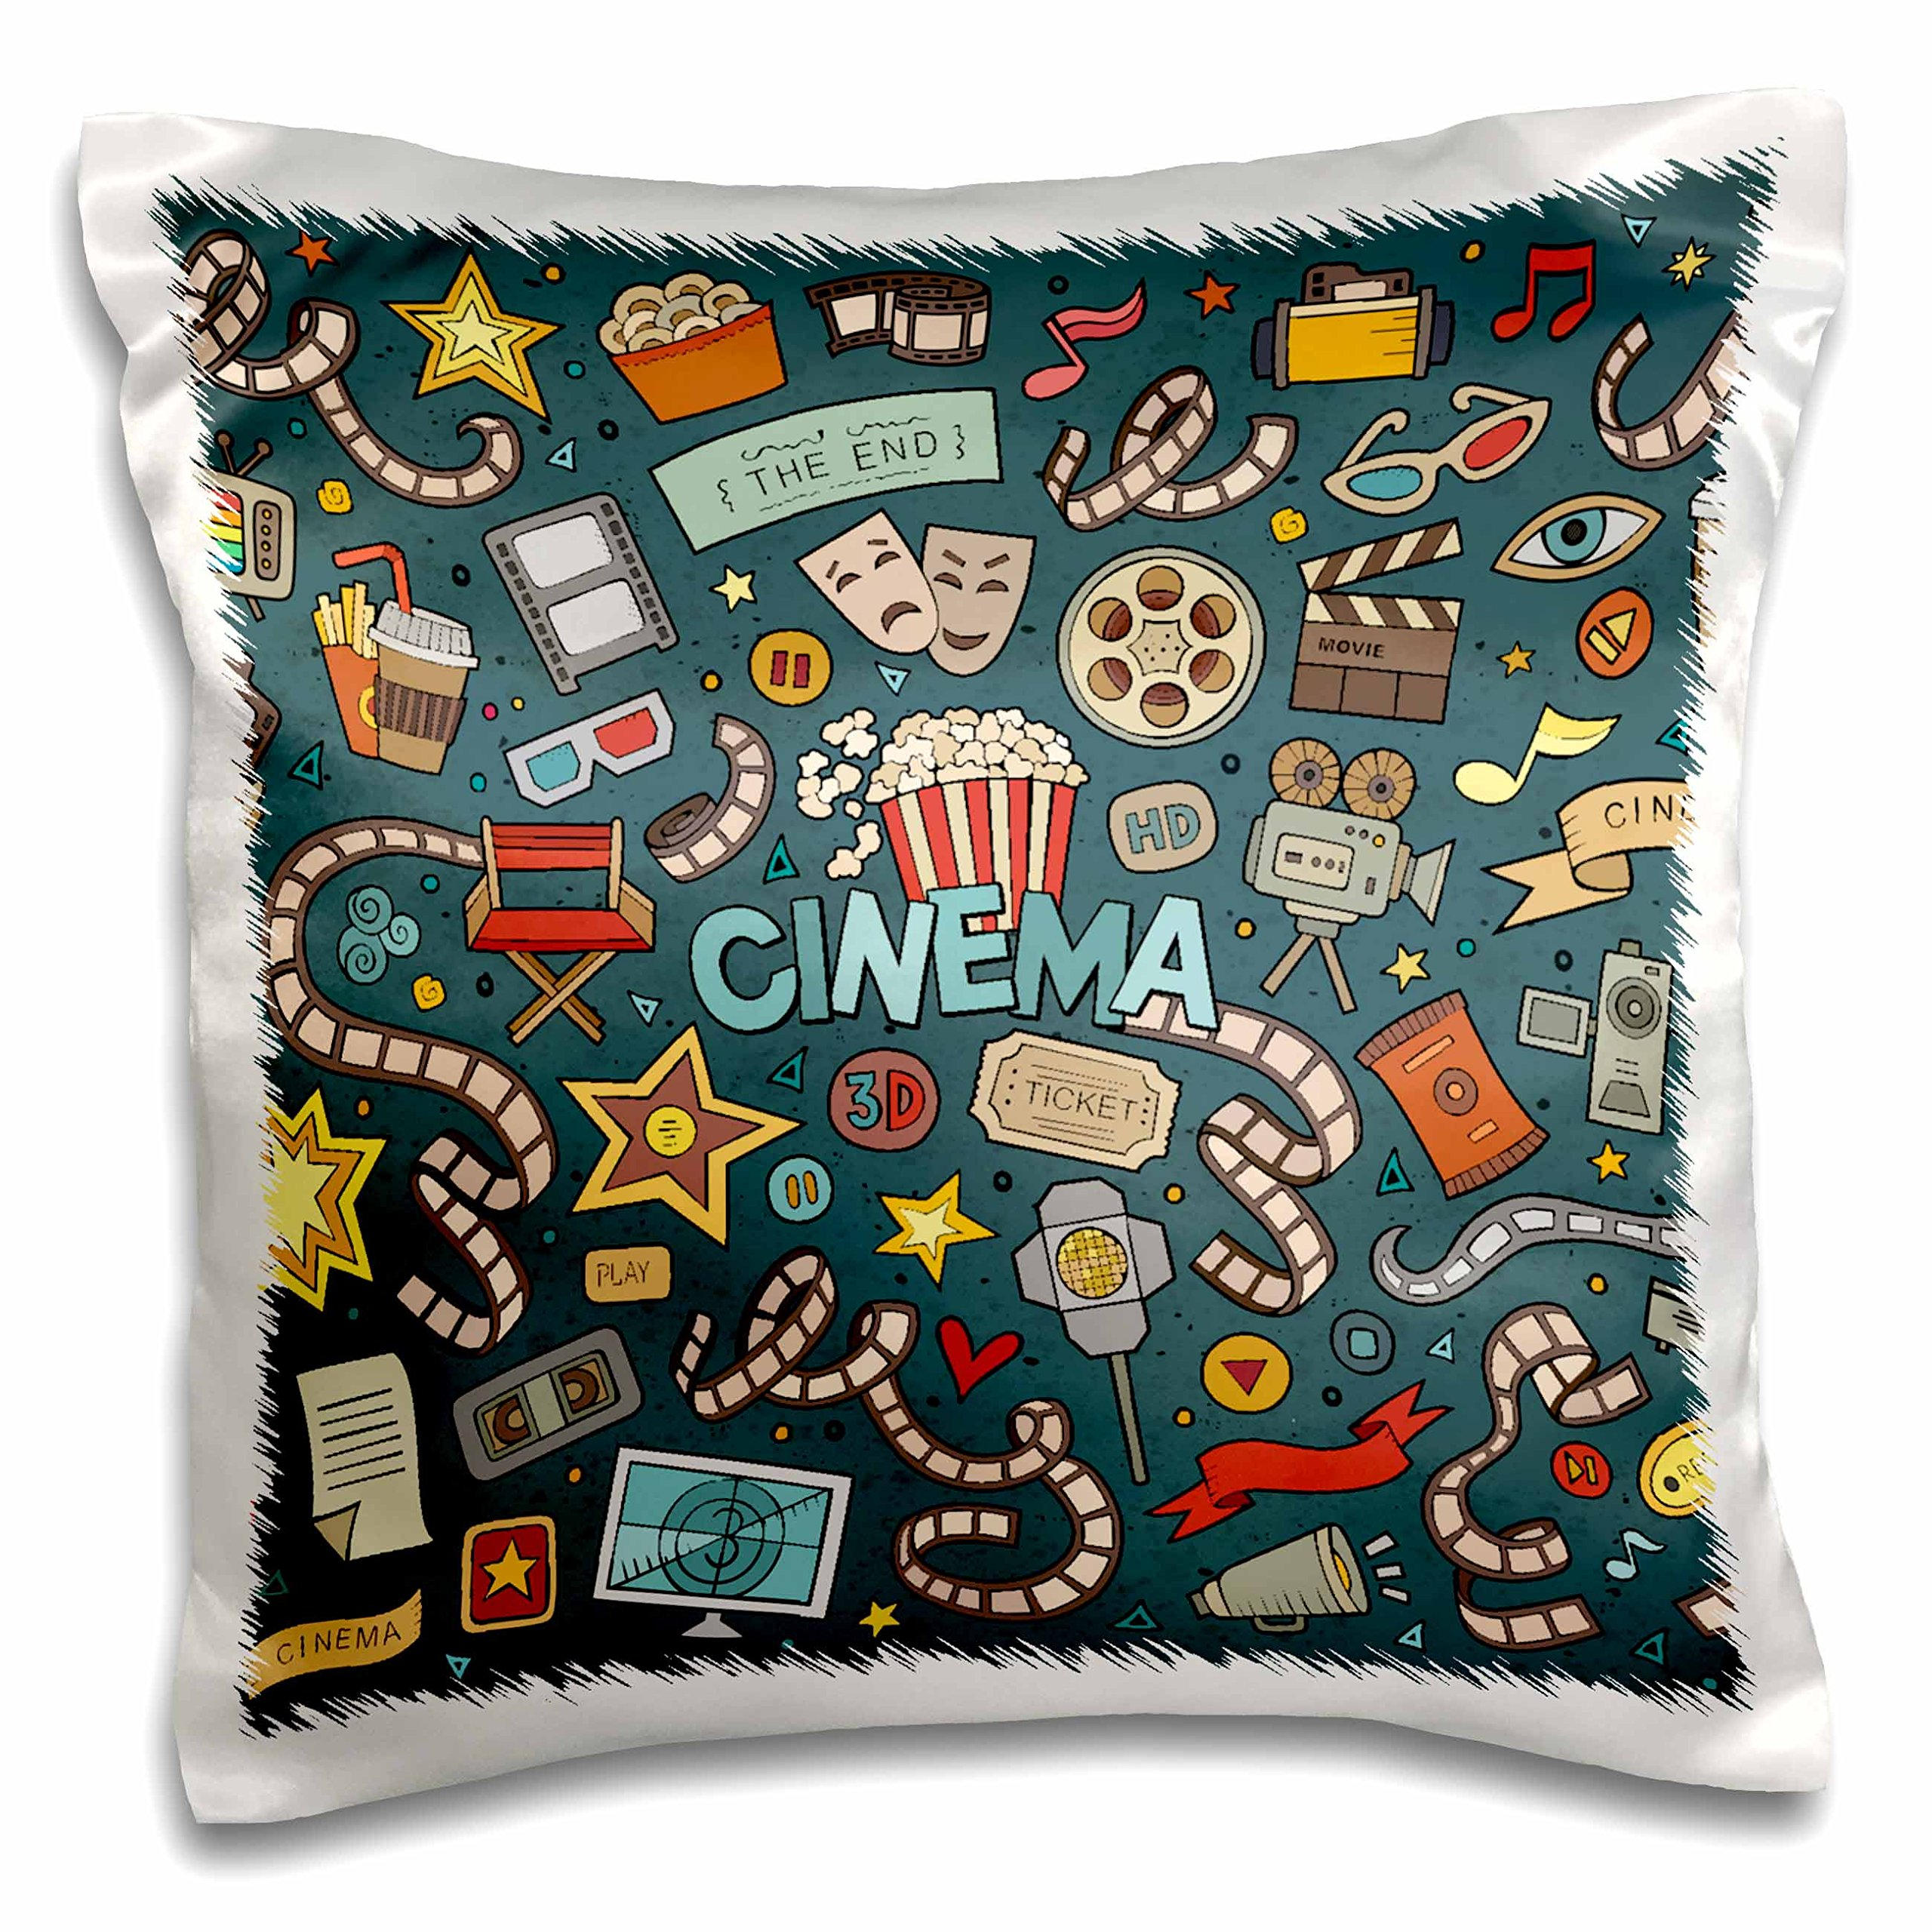 3D Rose Cinema Fan Goer Cute Illustration Movies Silver Screen Pillow Cases, 16'' x 16''